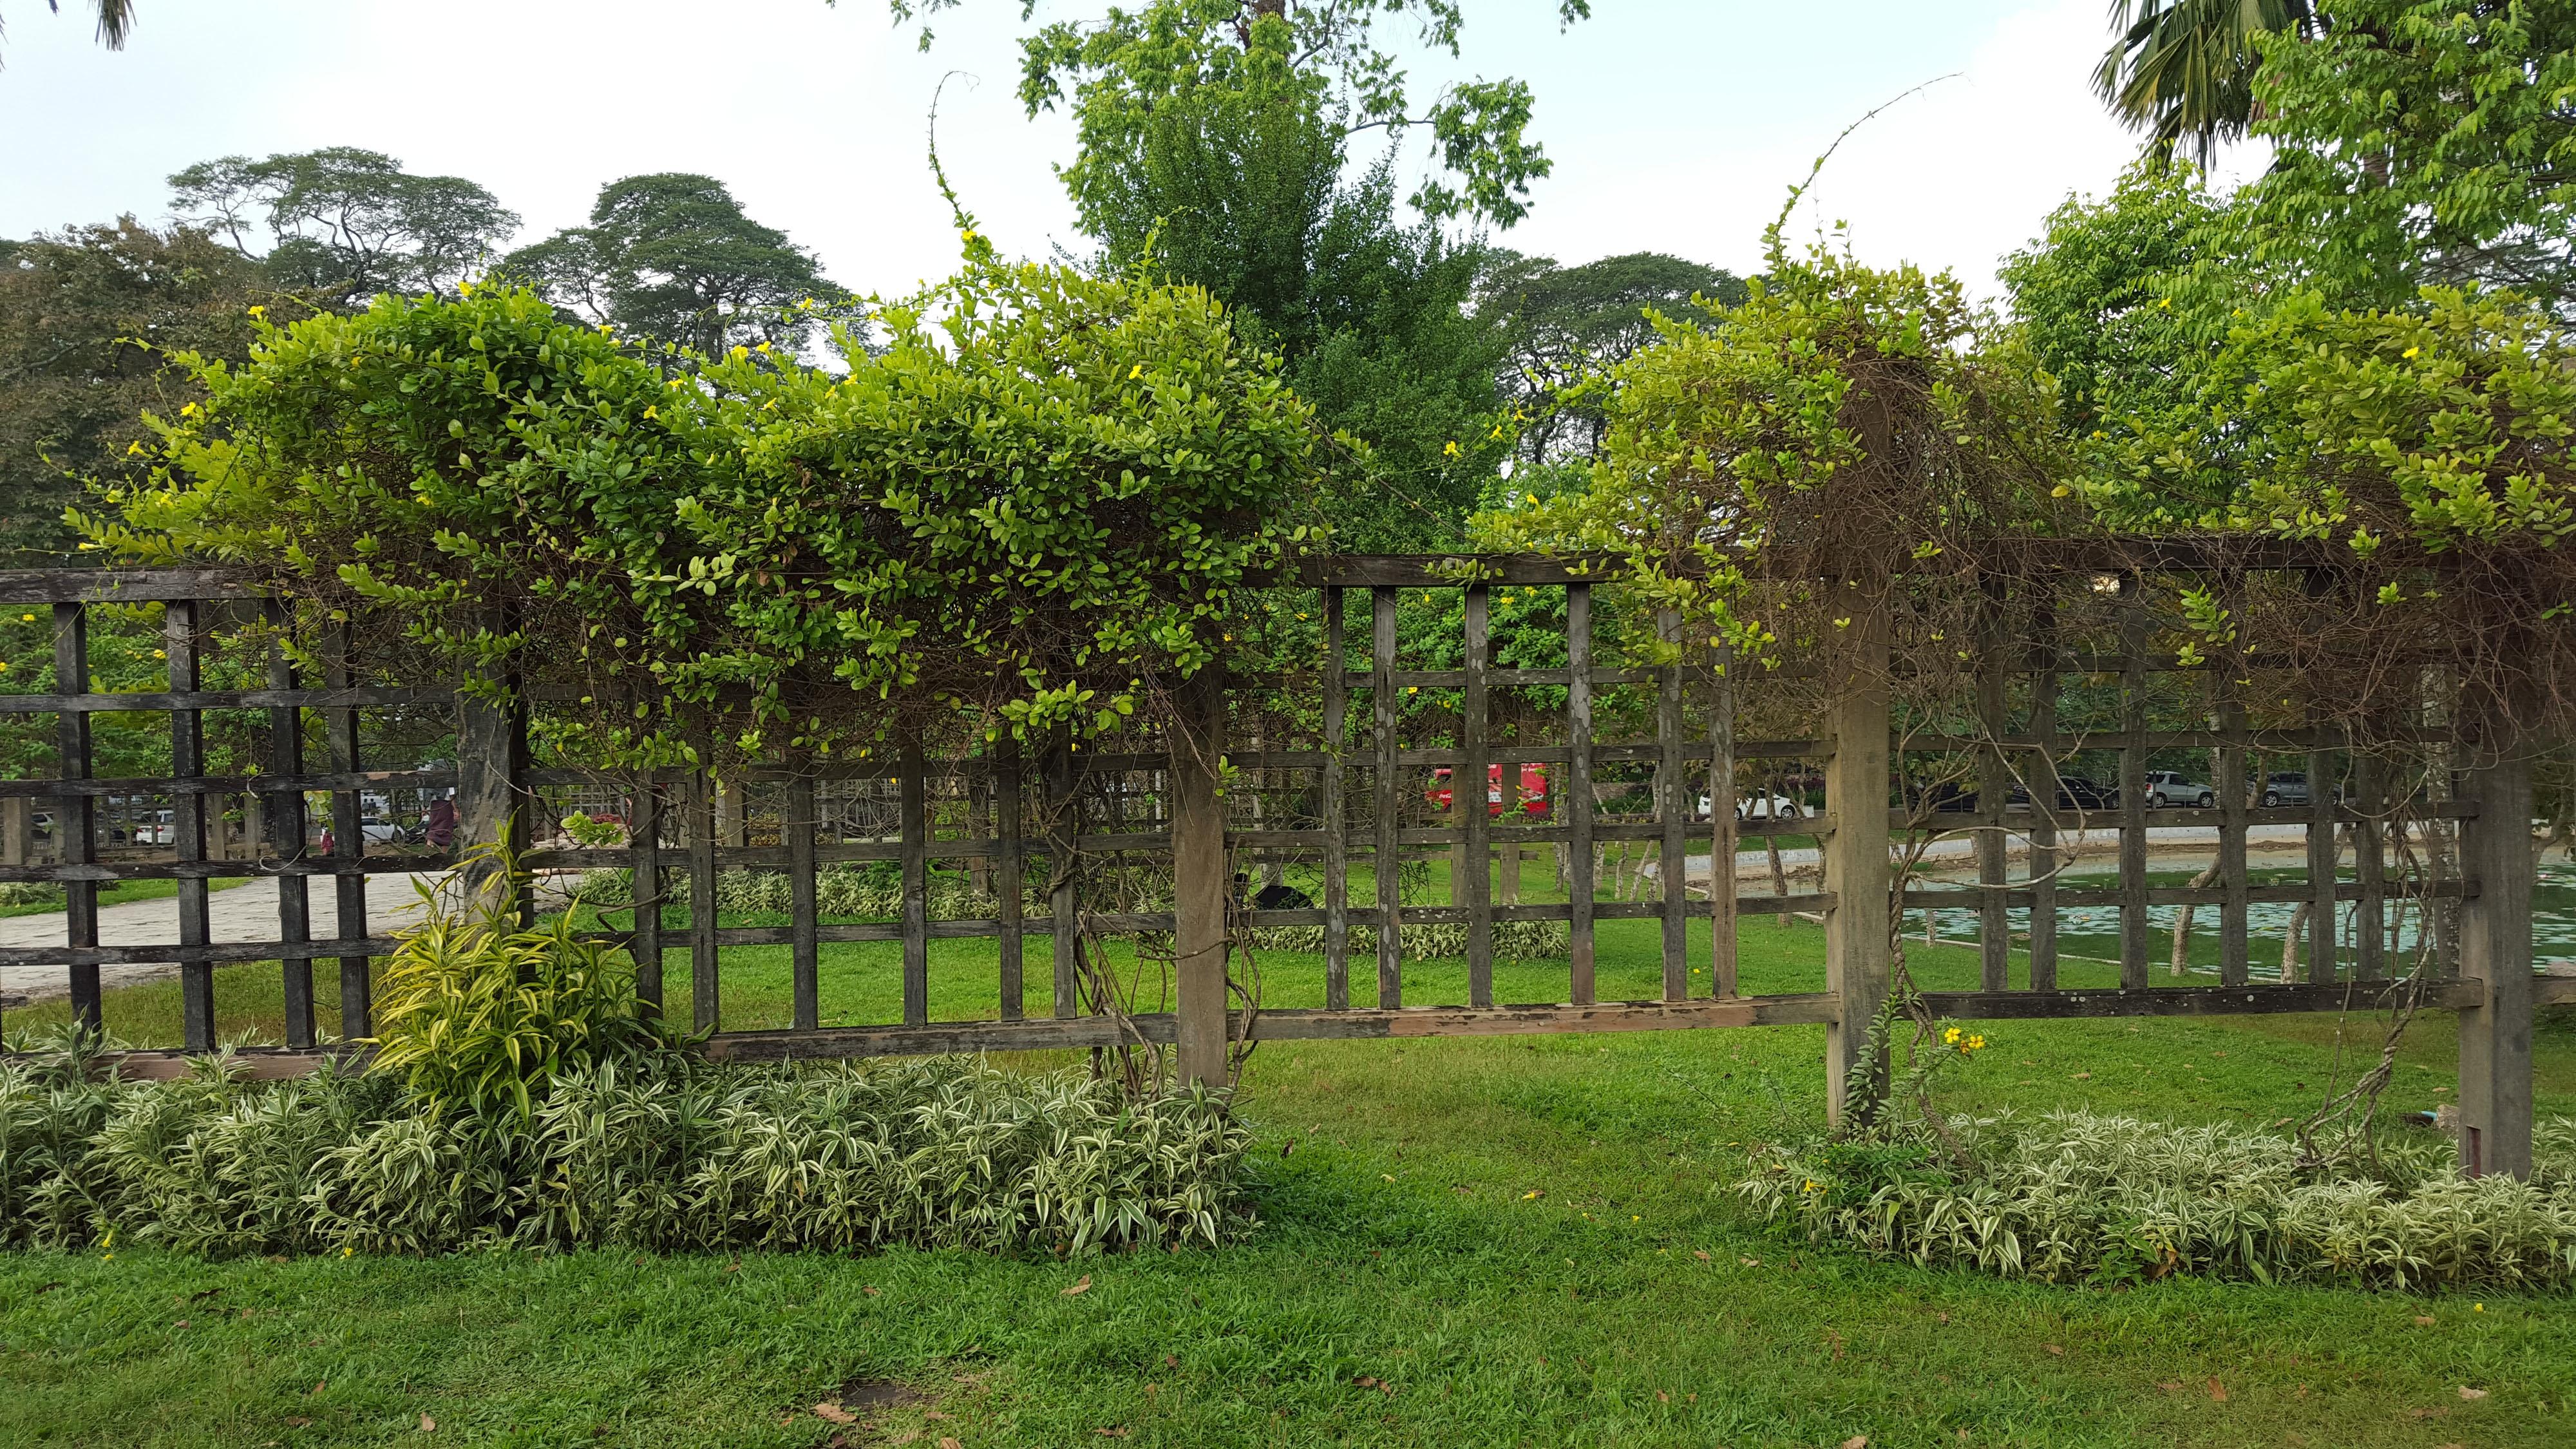 Gambar Pohon Pagar Halaman Rumput Bunga Pondok